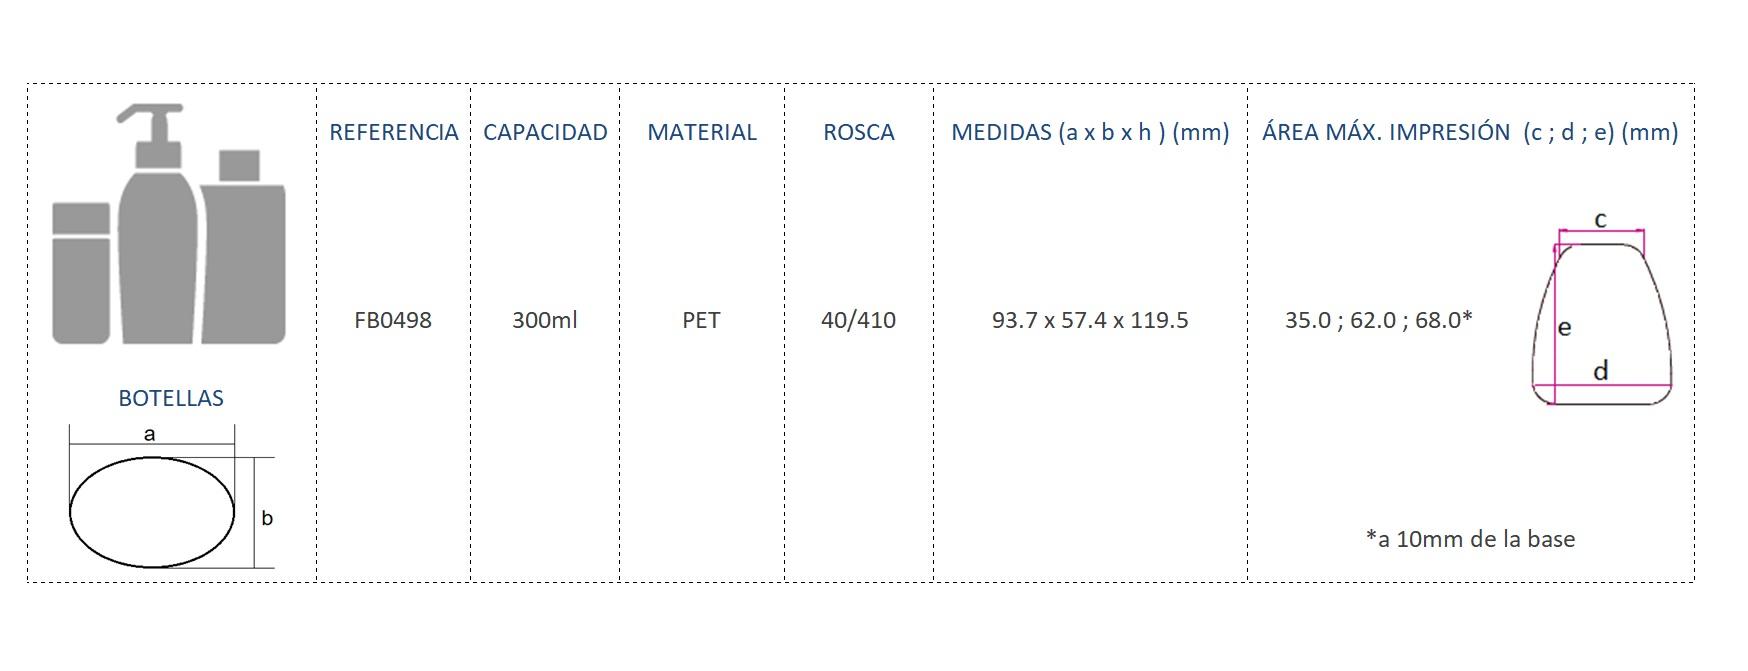 Cuadro de materiales botella FB0498